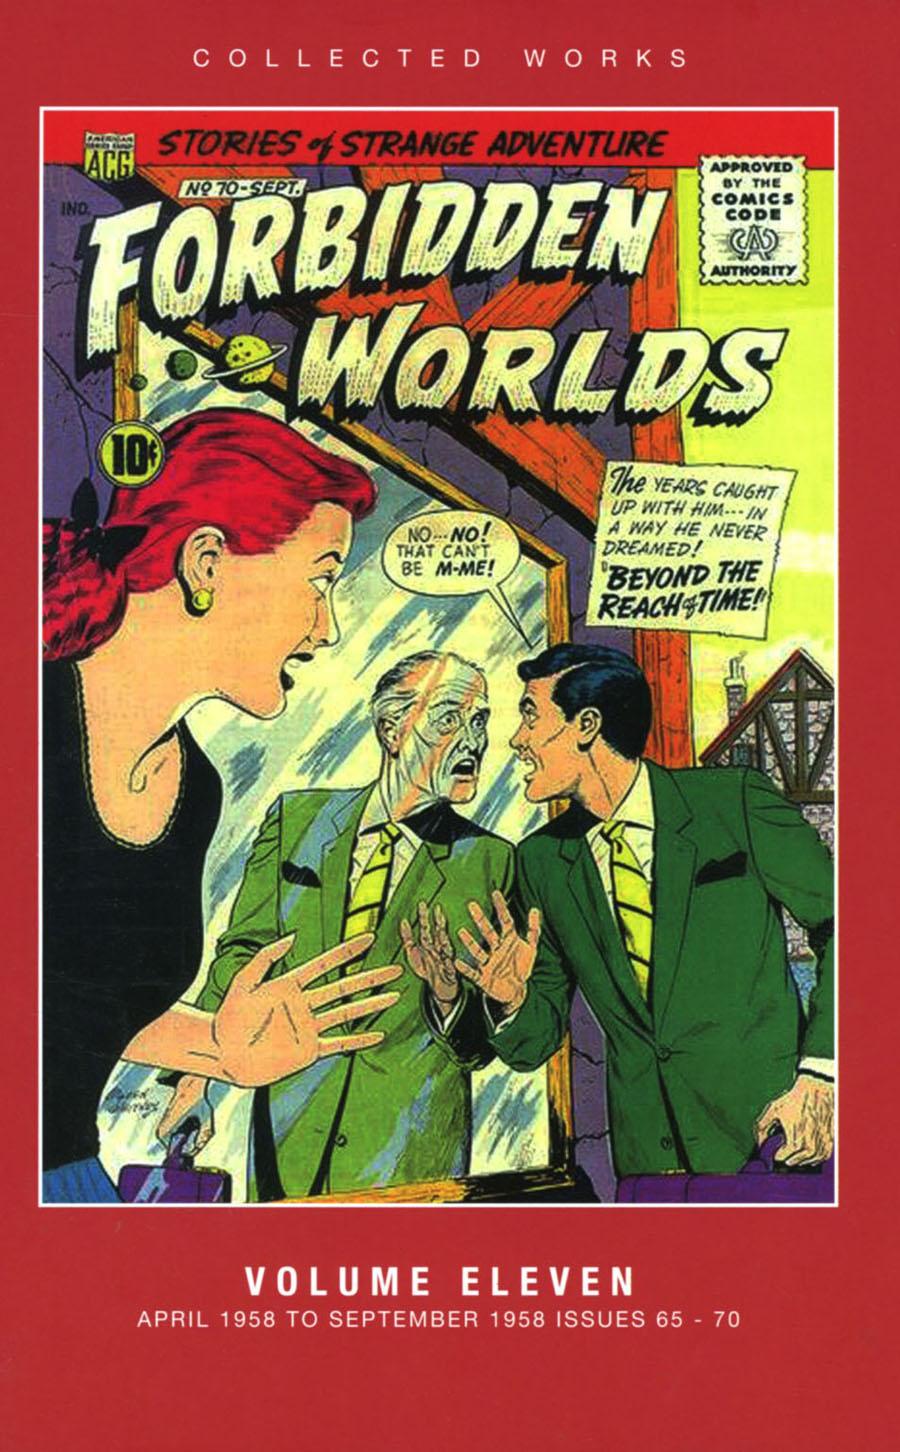 ACG Collected Works Forbidden Worlds Vol 11 HC